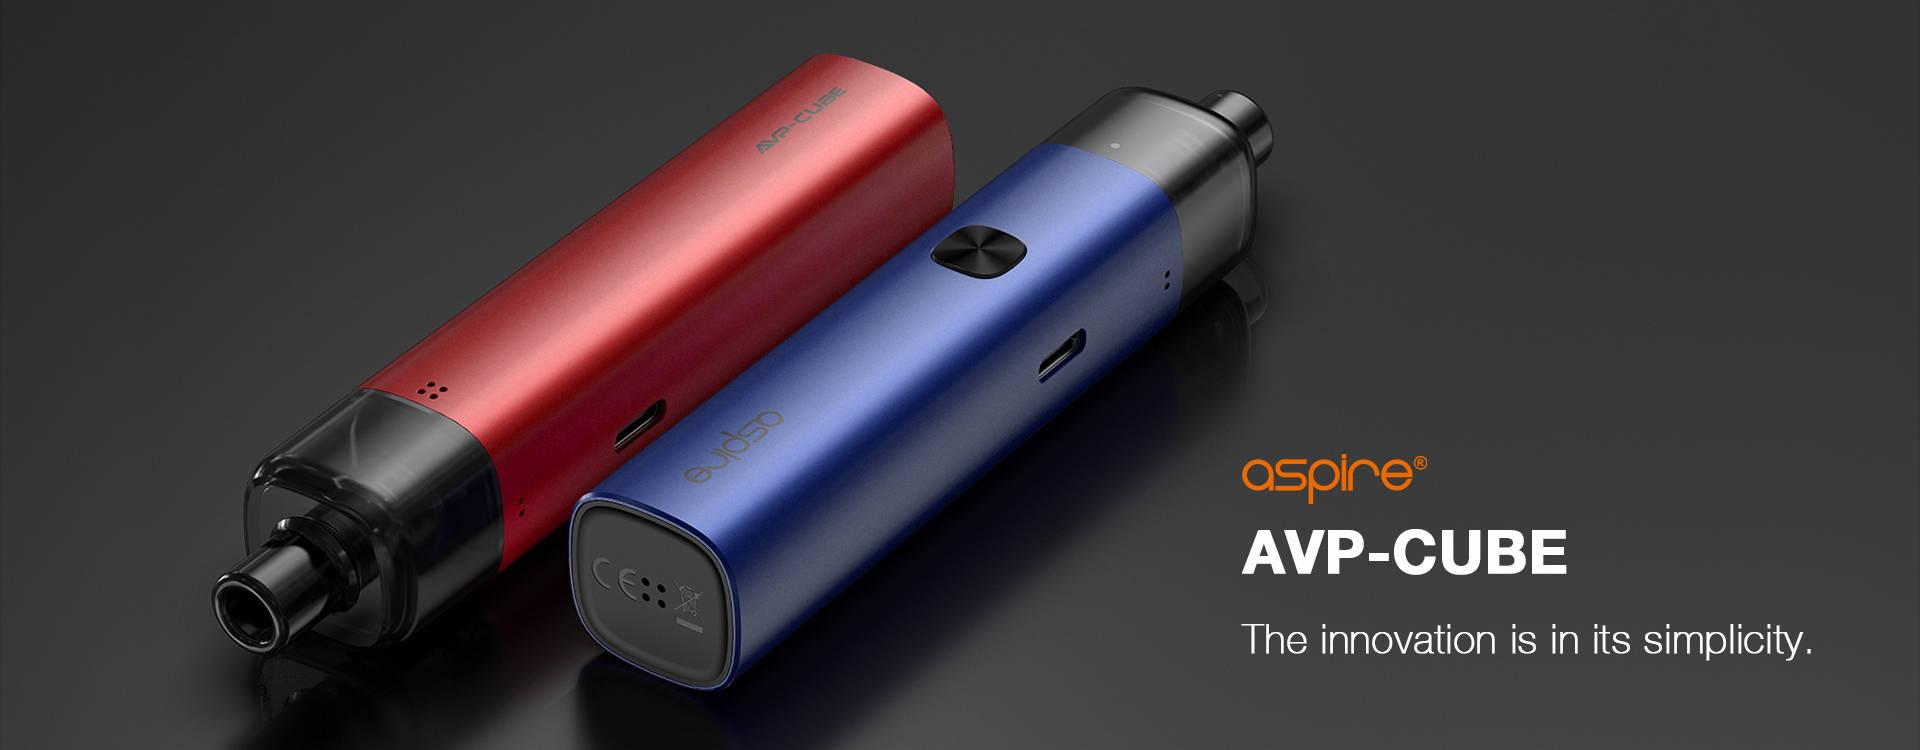 Aspire AVP Cube | Vape Pod Device | Buy Aspire AVP Cube Pod Kit Online